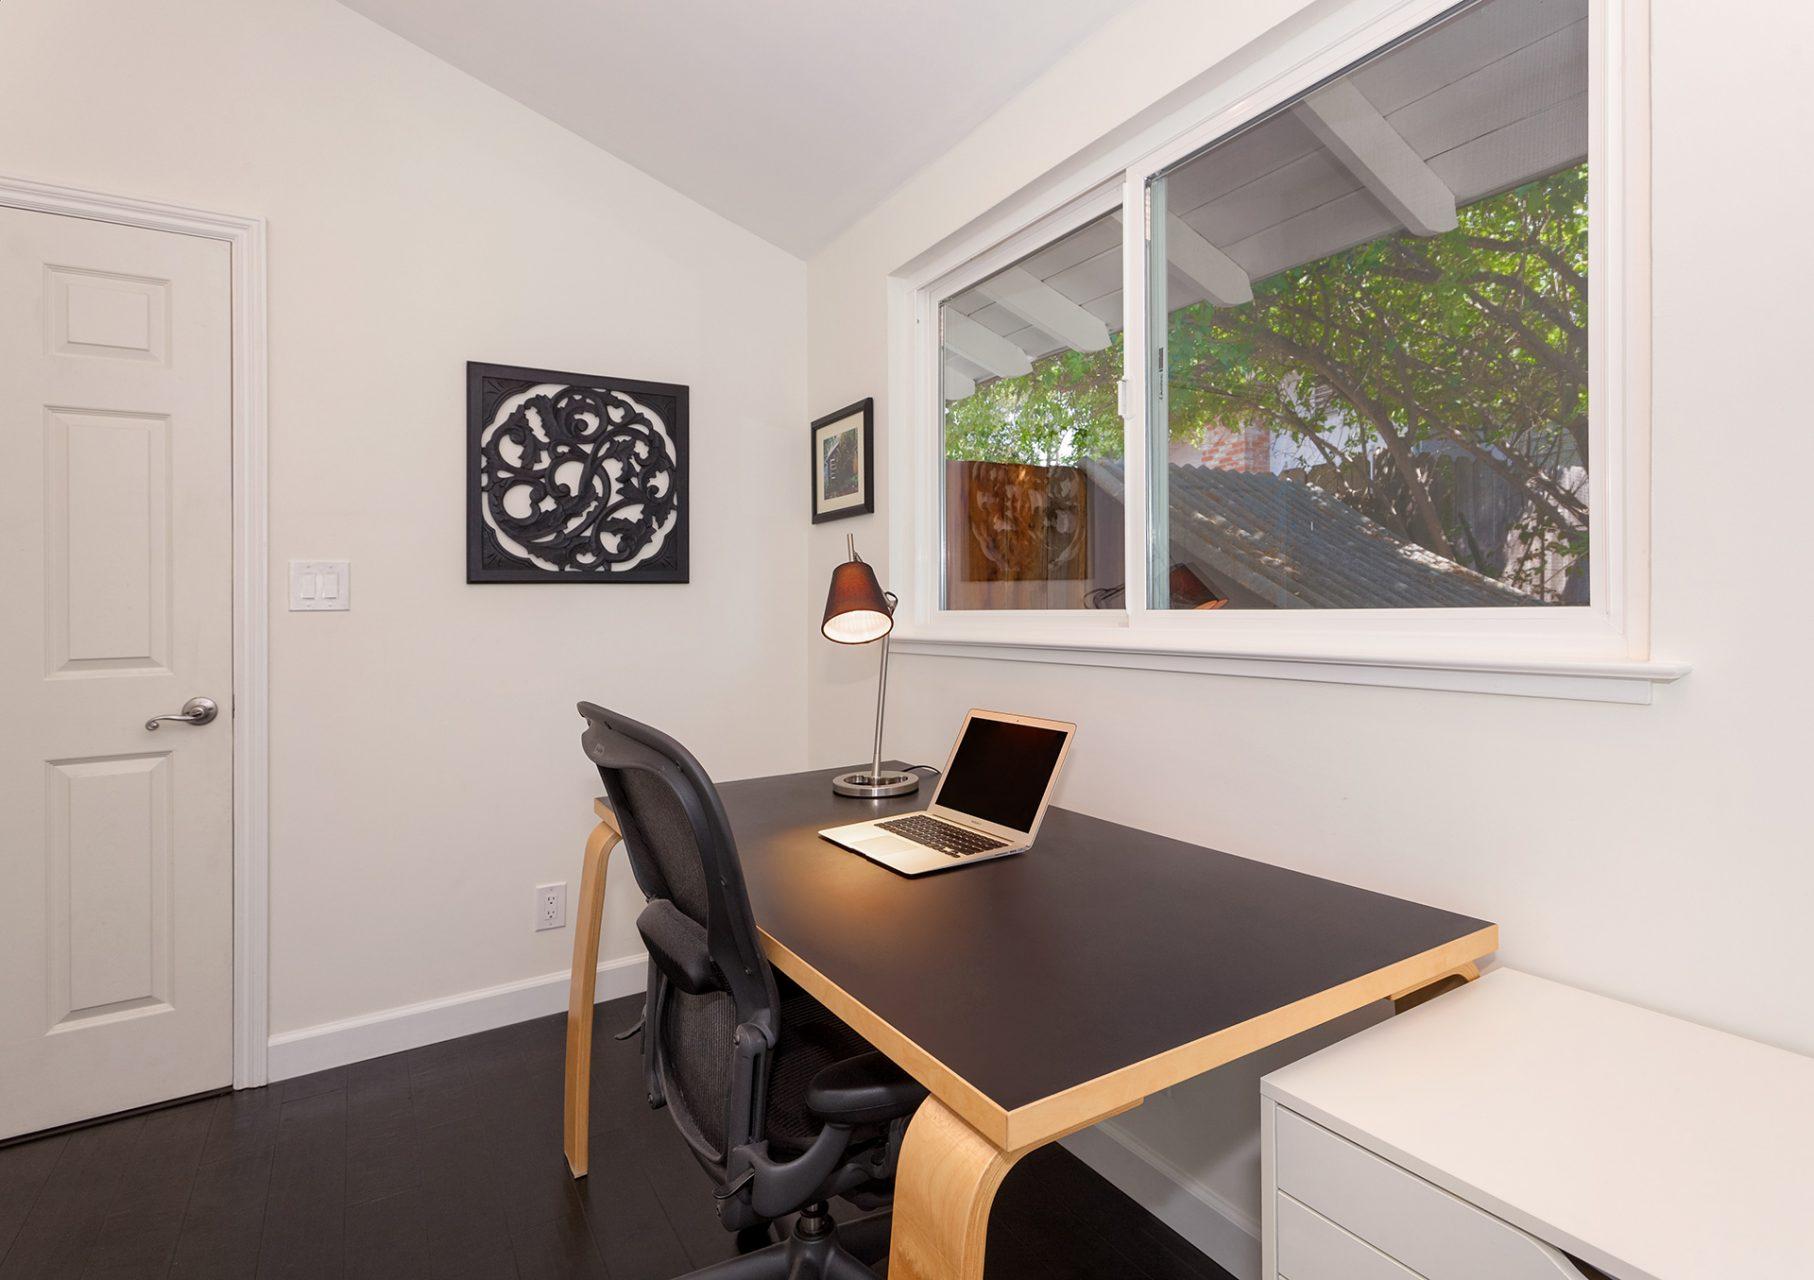 plain desk